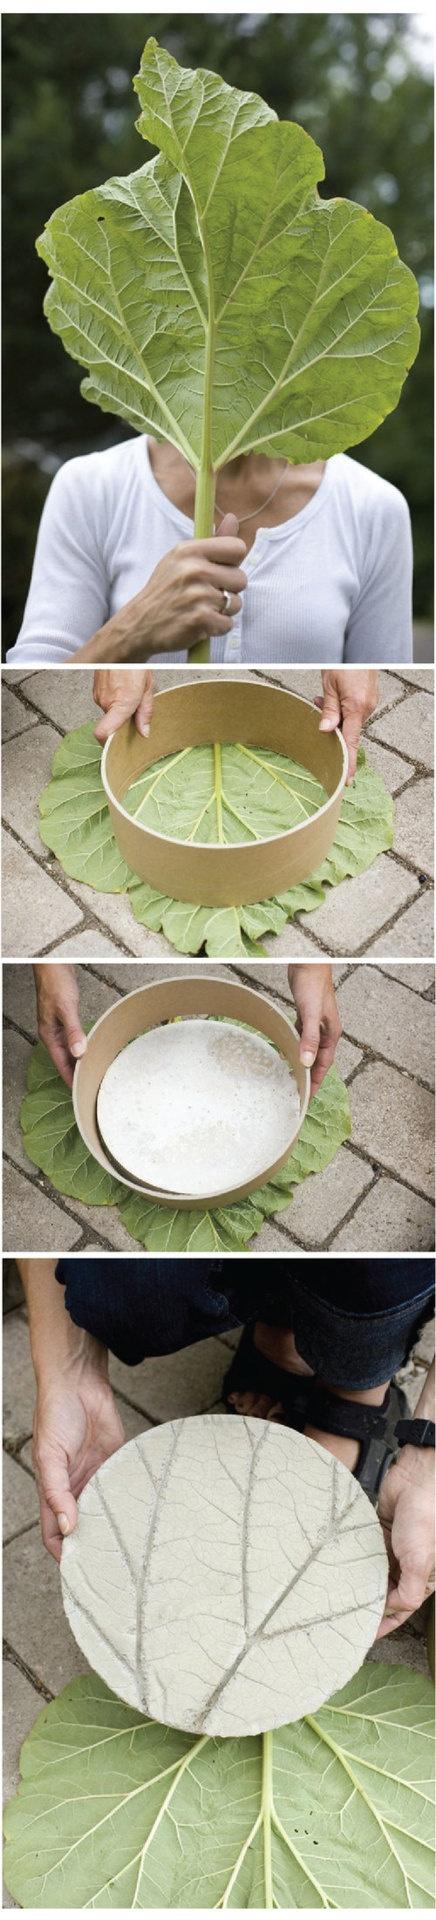 Leaf imprinted garden stepping stones for the home for Pinterest garden stones